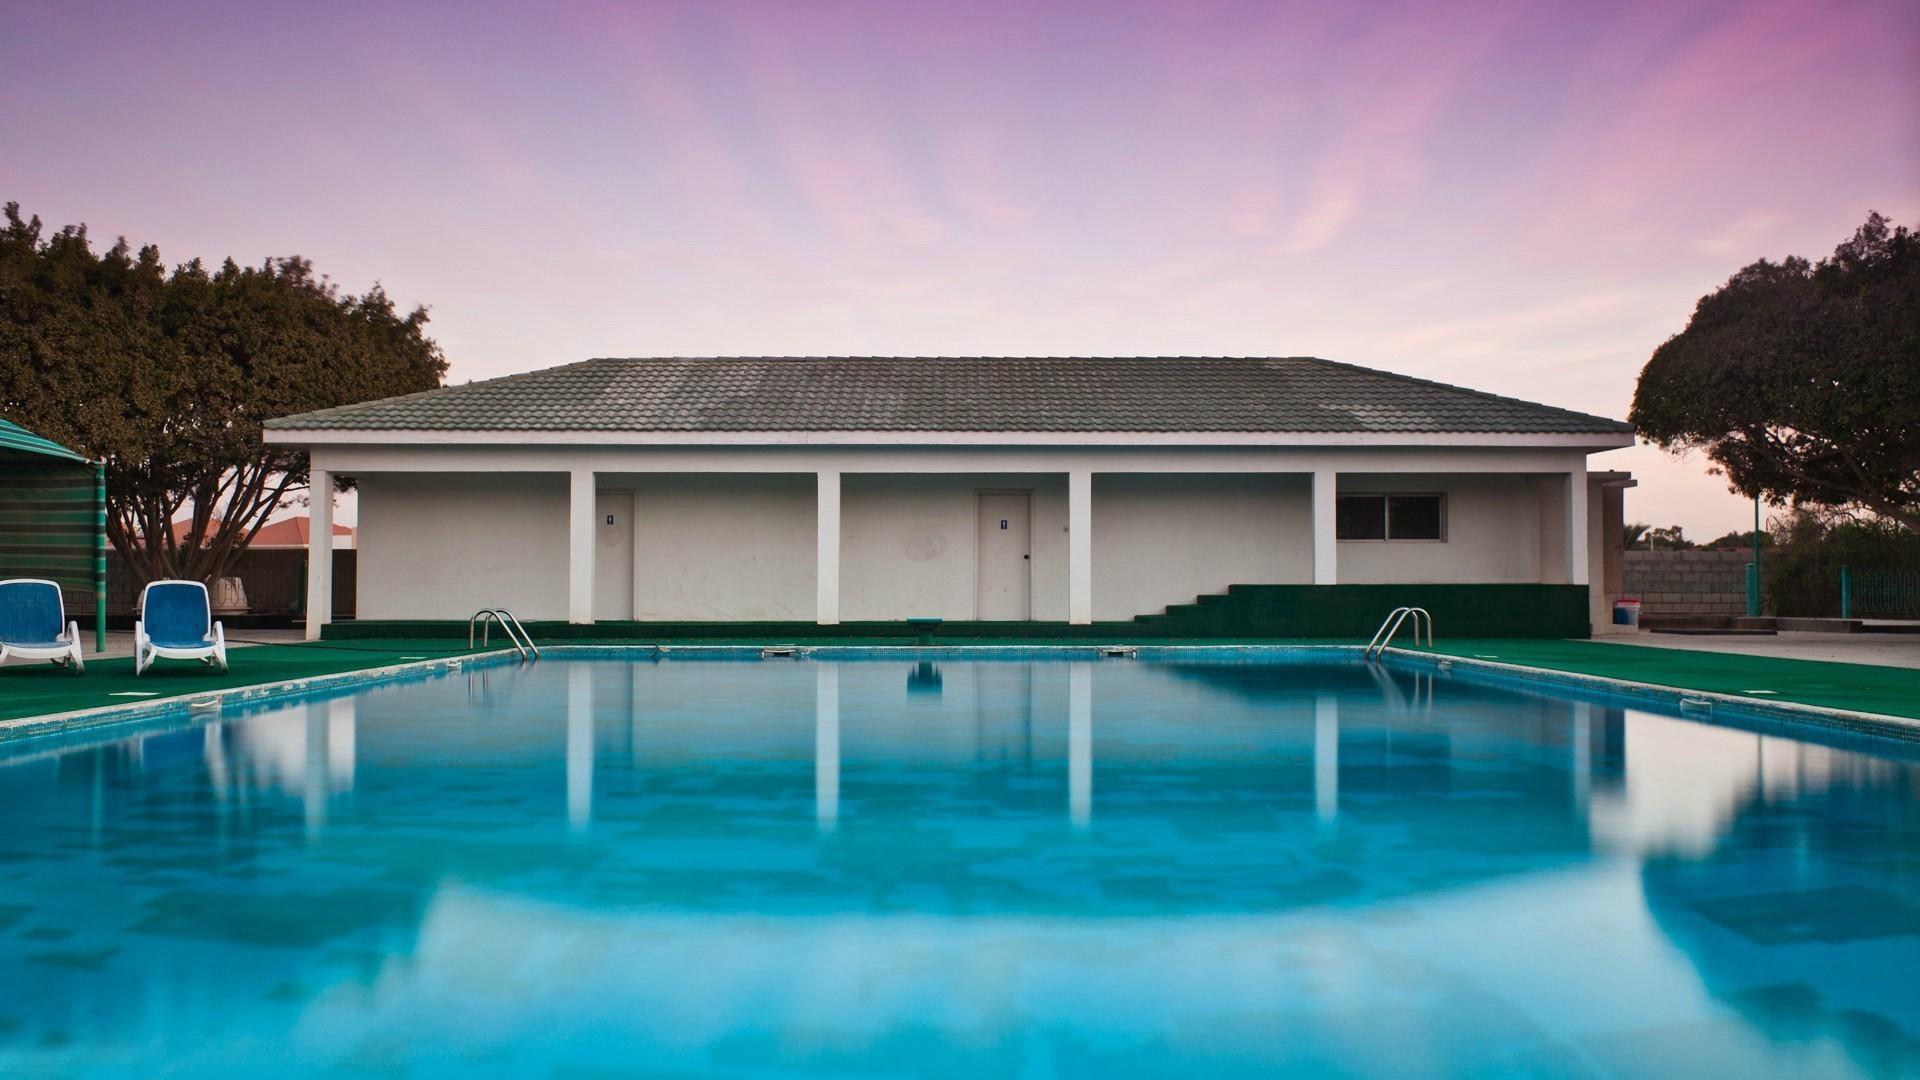 Landschaft Haus Pool Erholungsort Hinterhof Immobilien Zuhause Villa Villa  1920x1080 Px Eigentum Grundeigentum